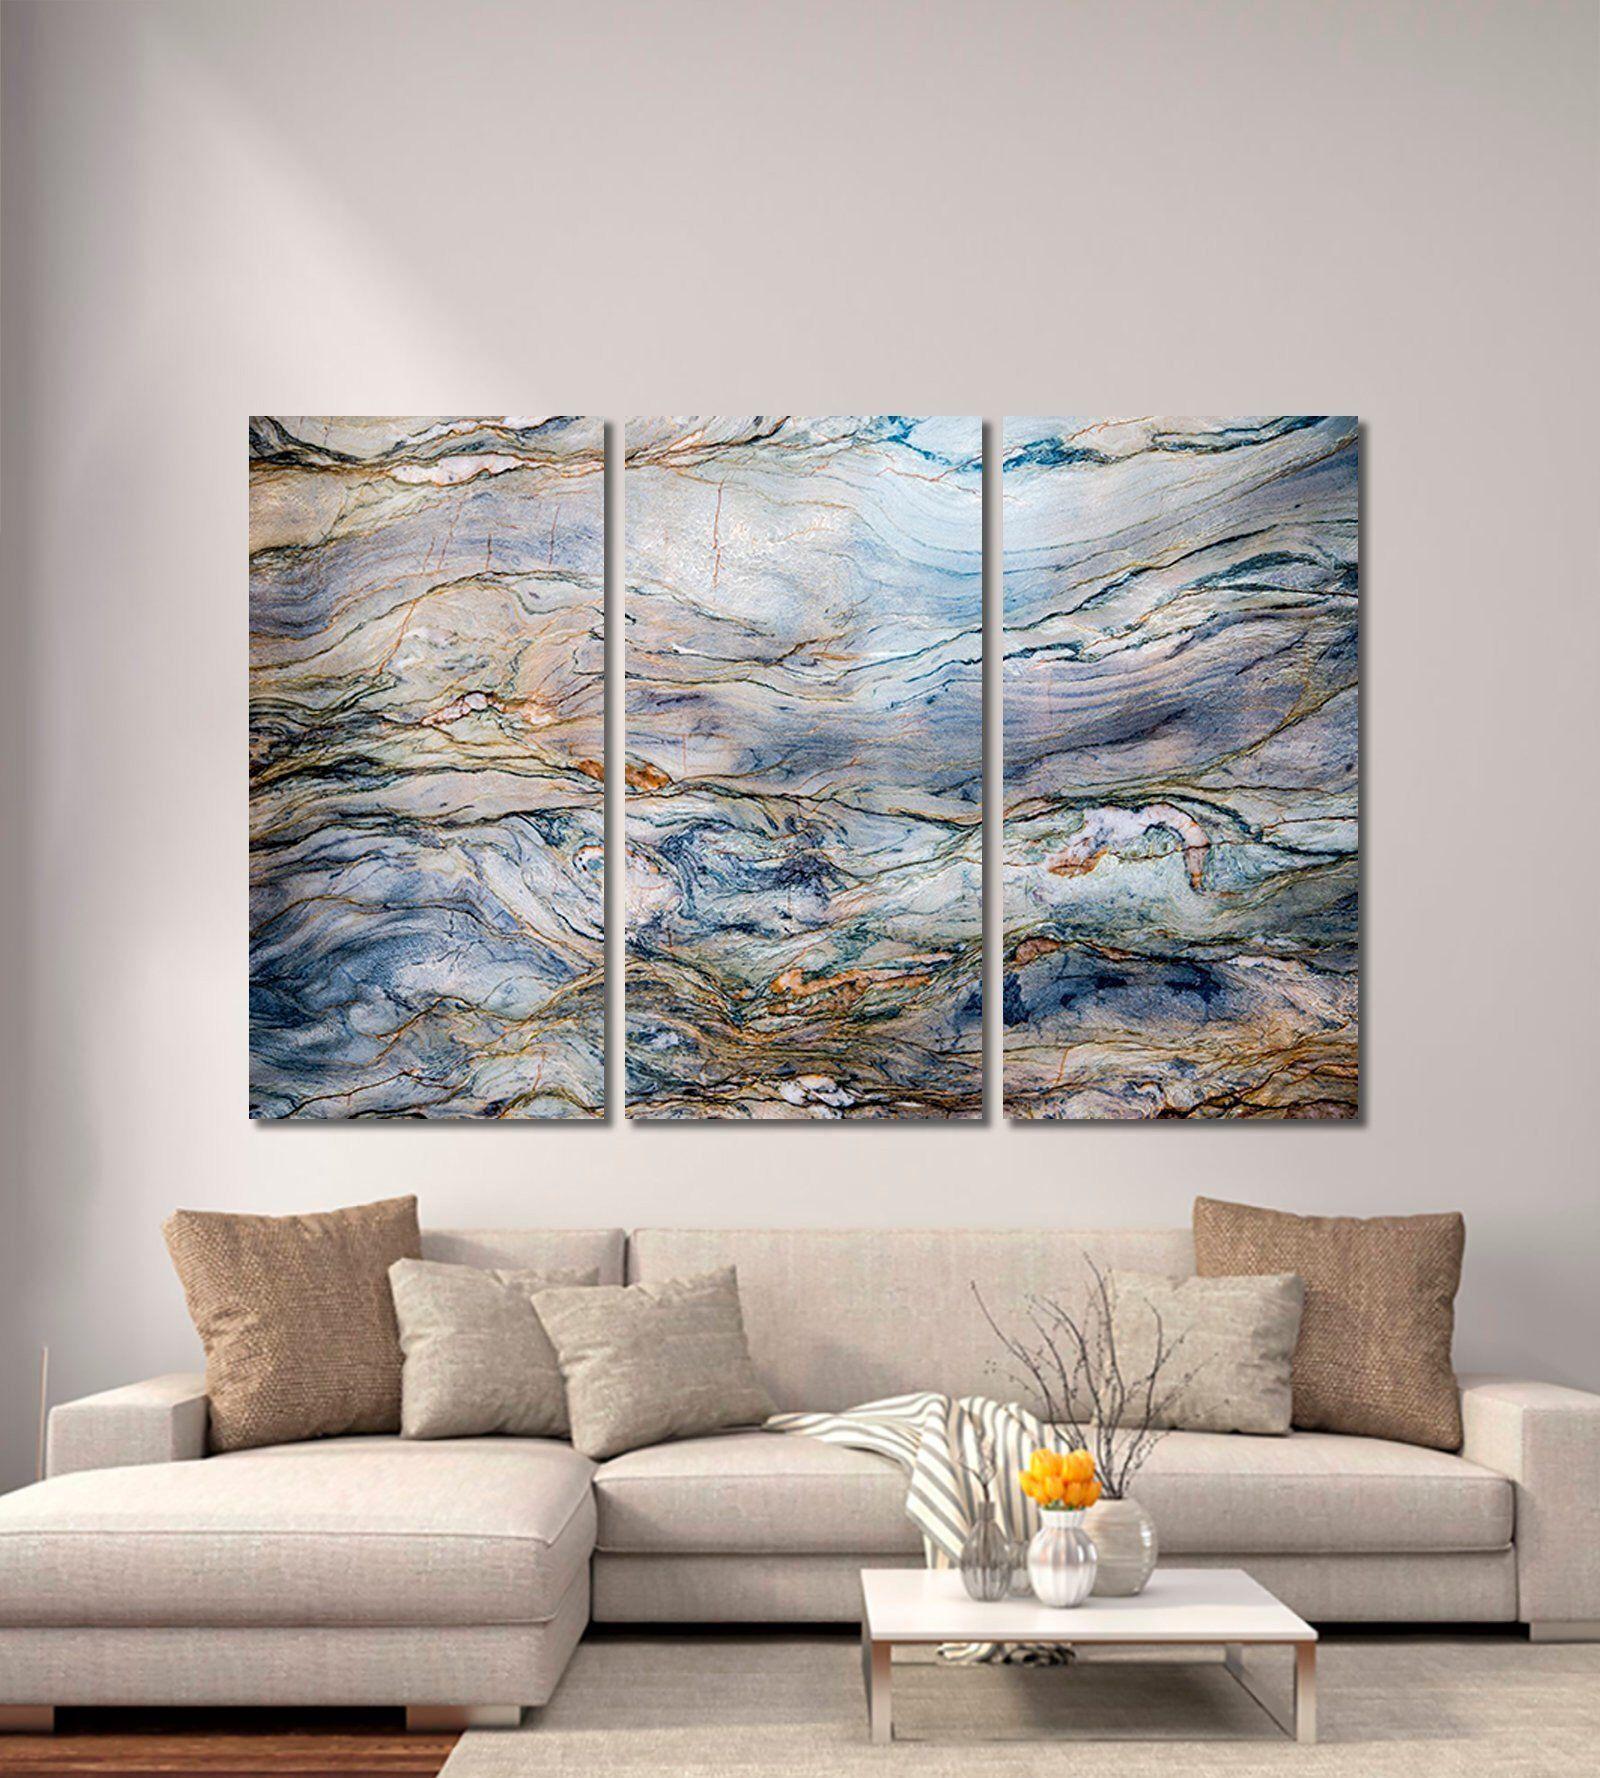 Marble Canvas Print Marble Wall Art Marble Canvas Art Etsy In 2020 Abstract Wall Decor Abstract Wall Art Canvas Art